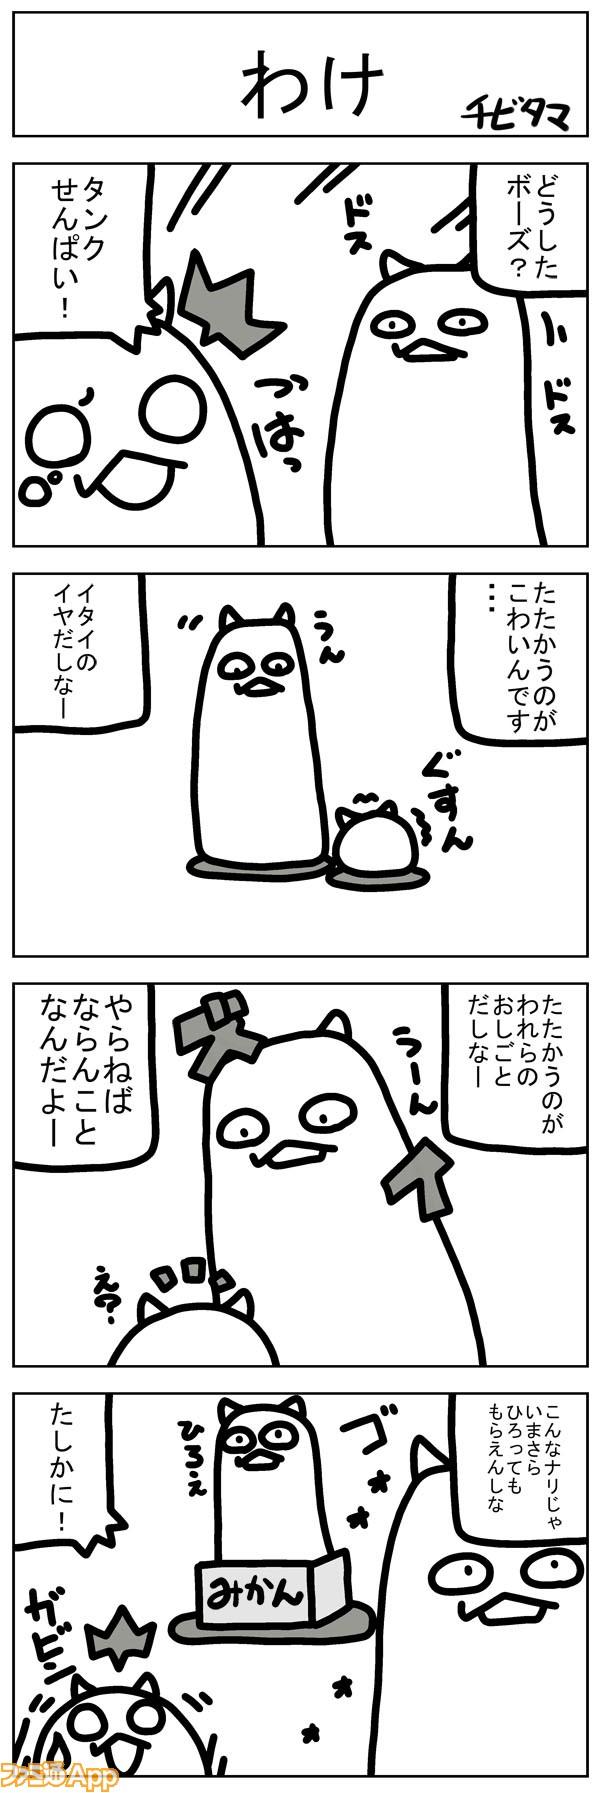 13tibi_002